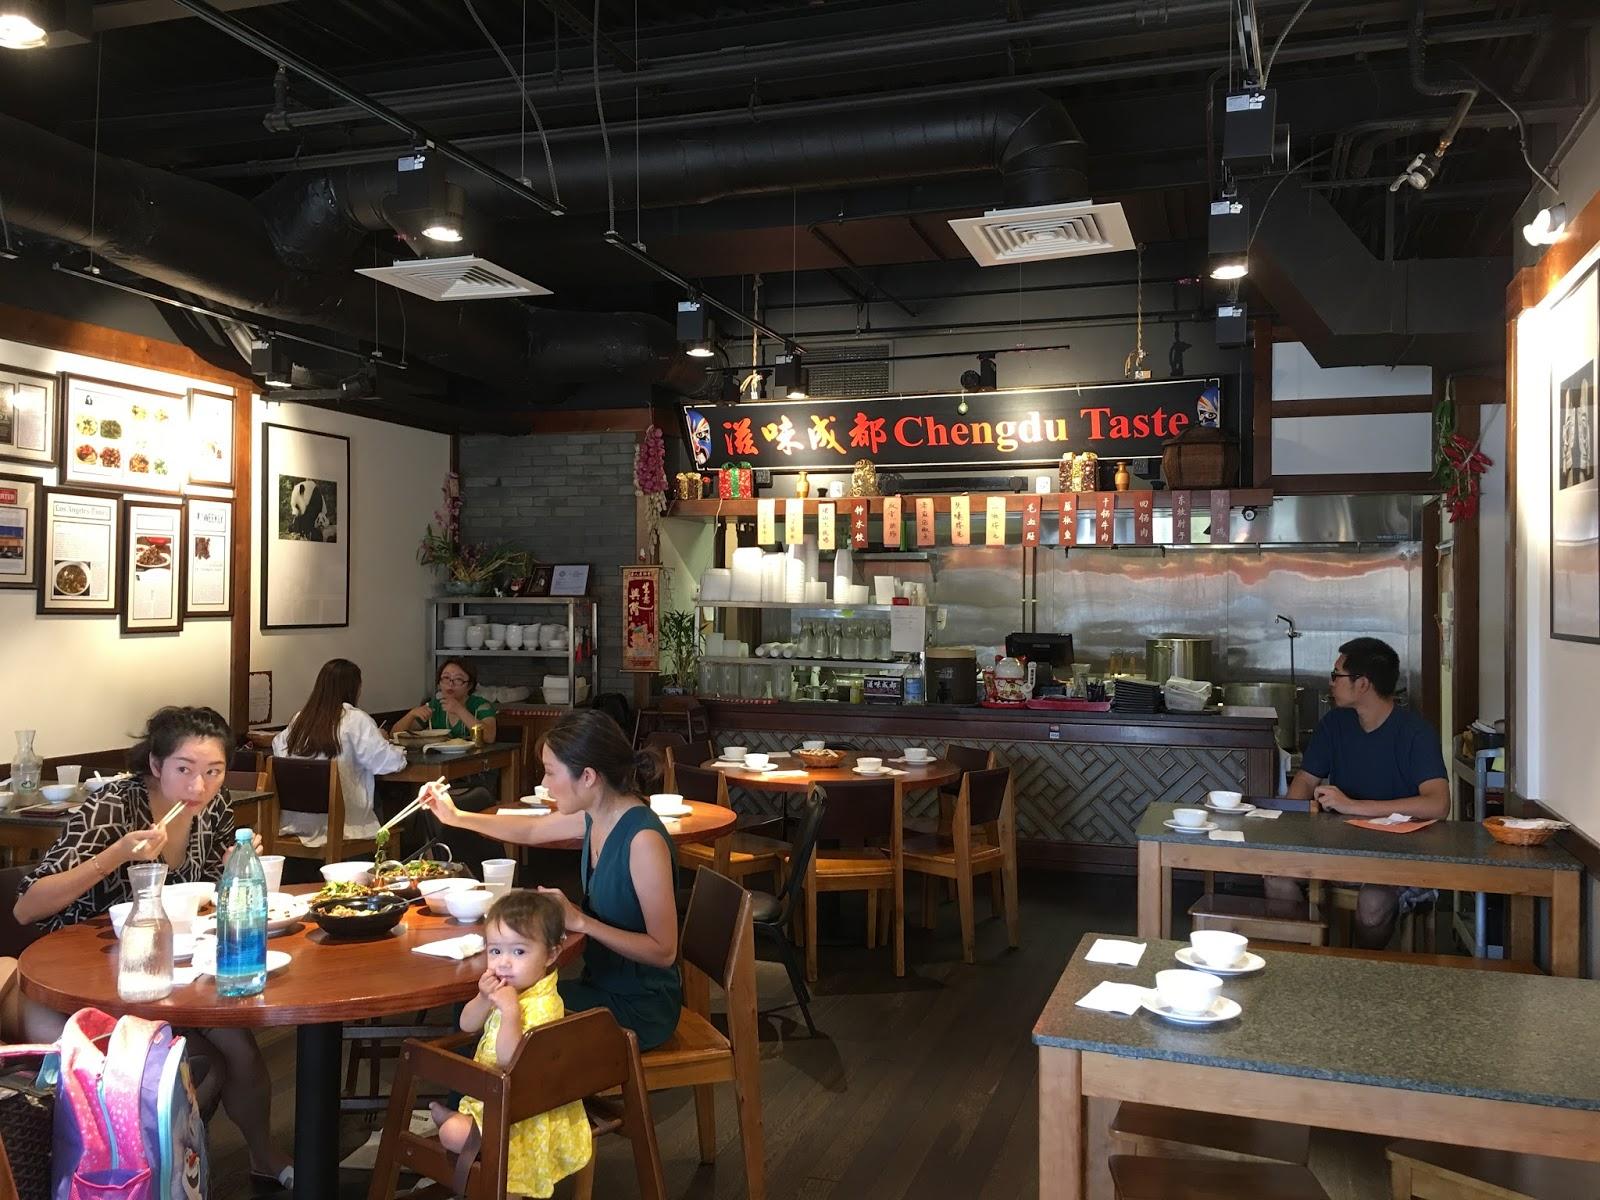 TASTE OF HAWAII: CHENGDU TASTE